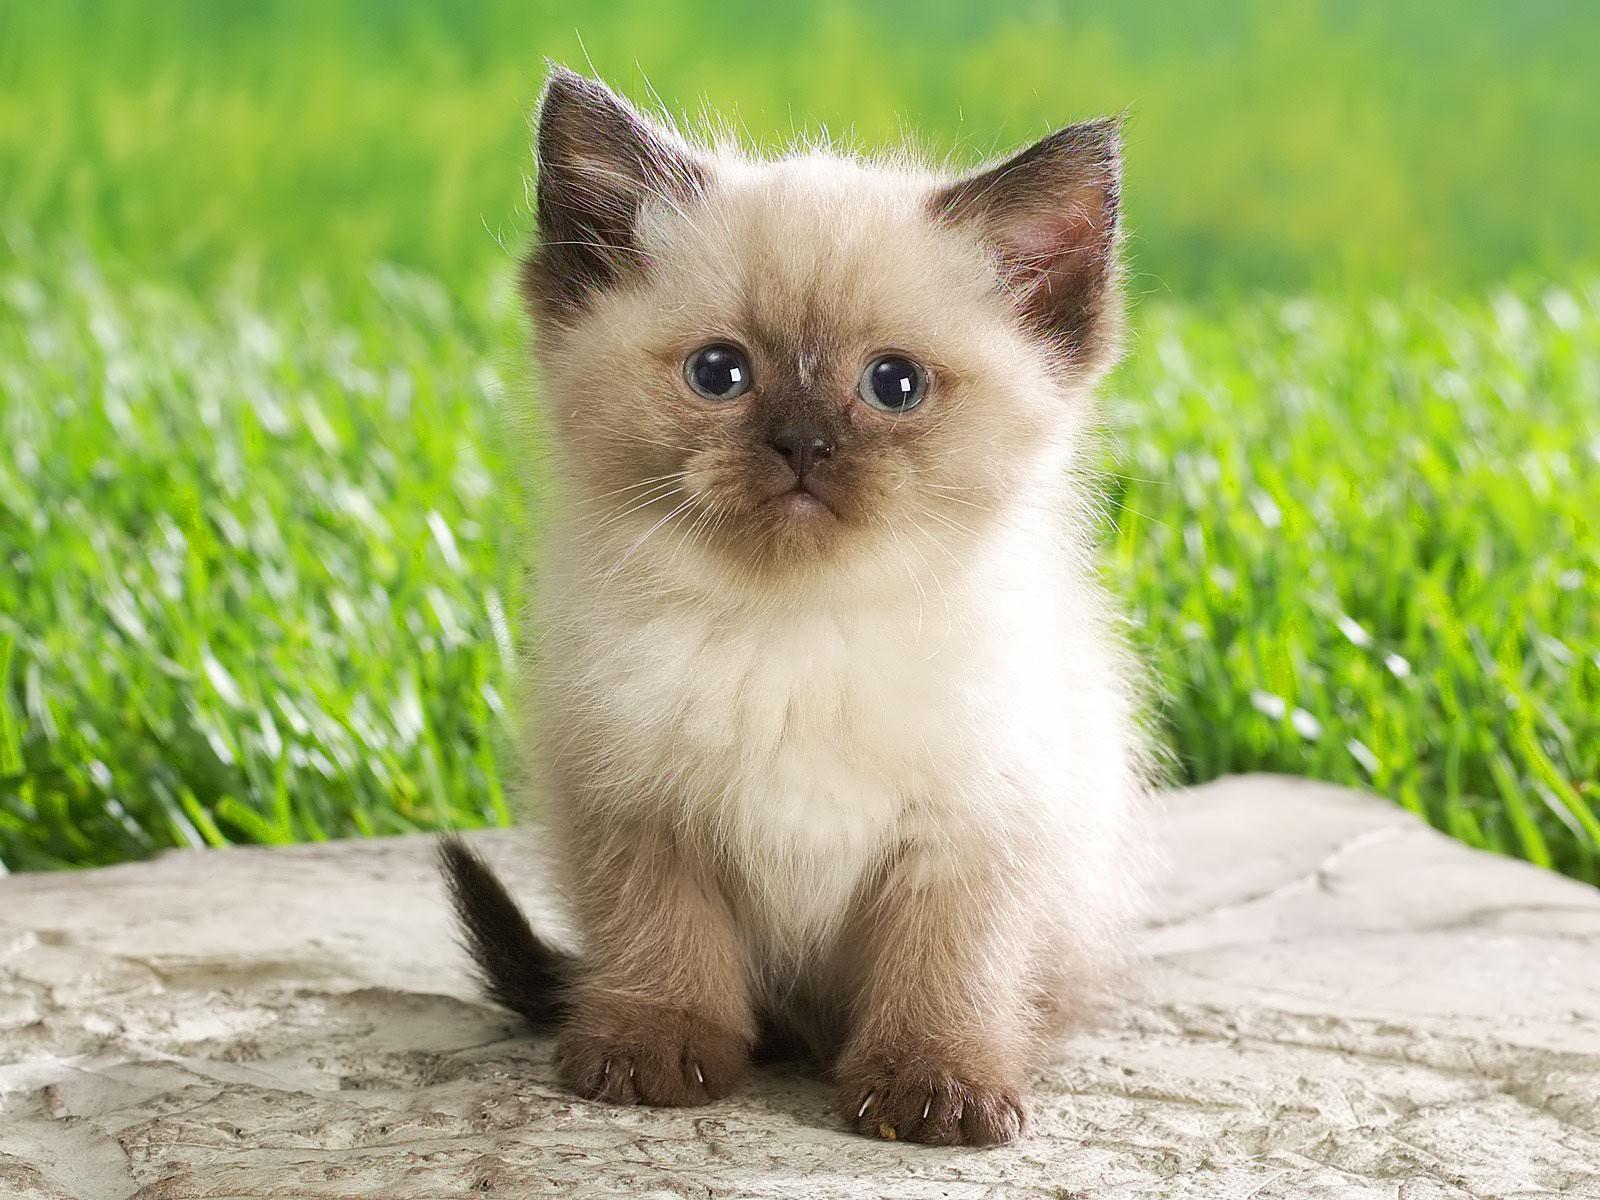 48+ Cute Baby Animal Wallpapers Free on WallpaperSafari